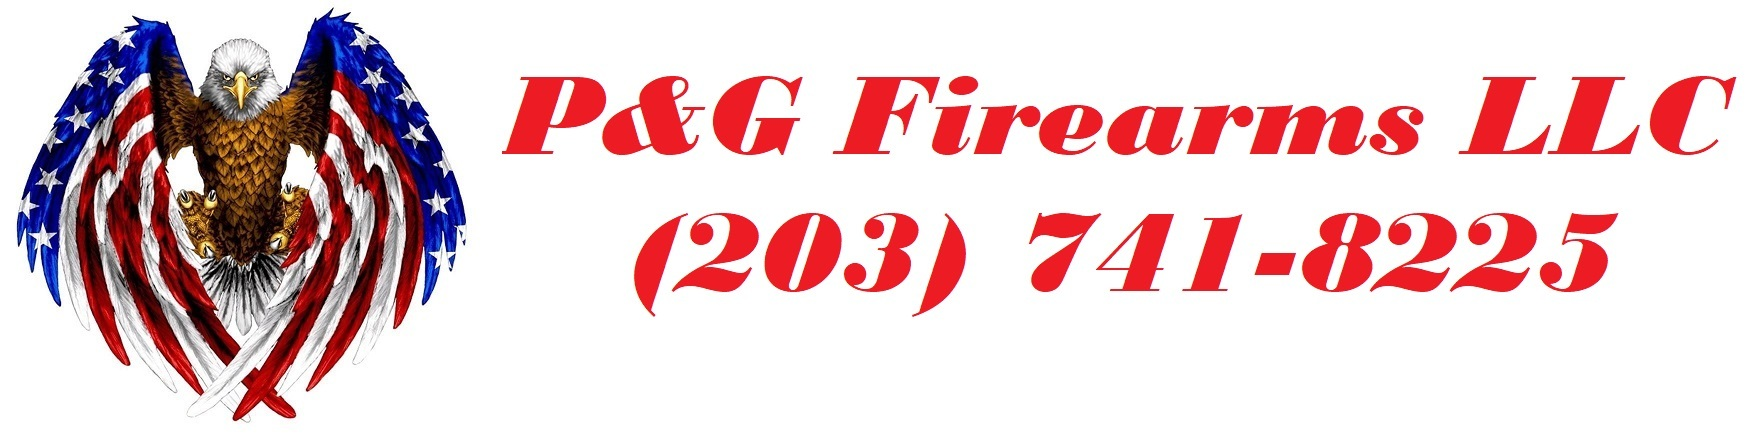 P&G Firearms LLC